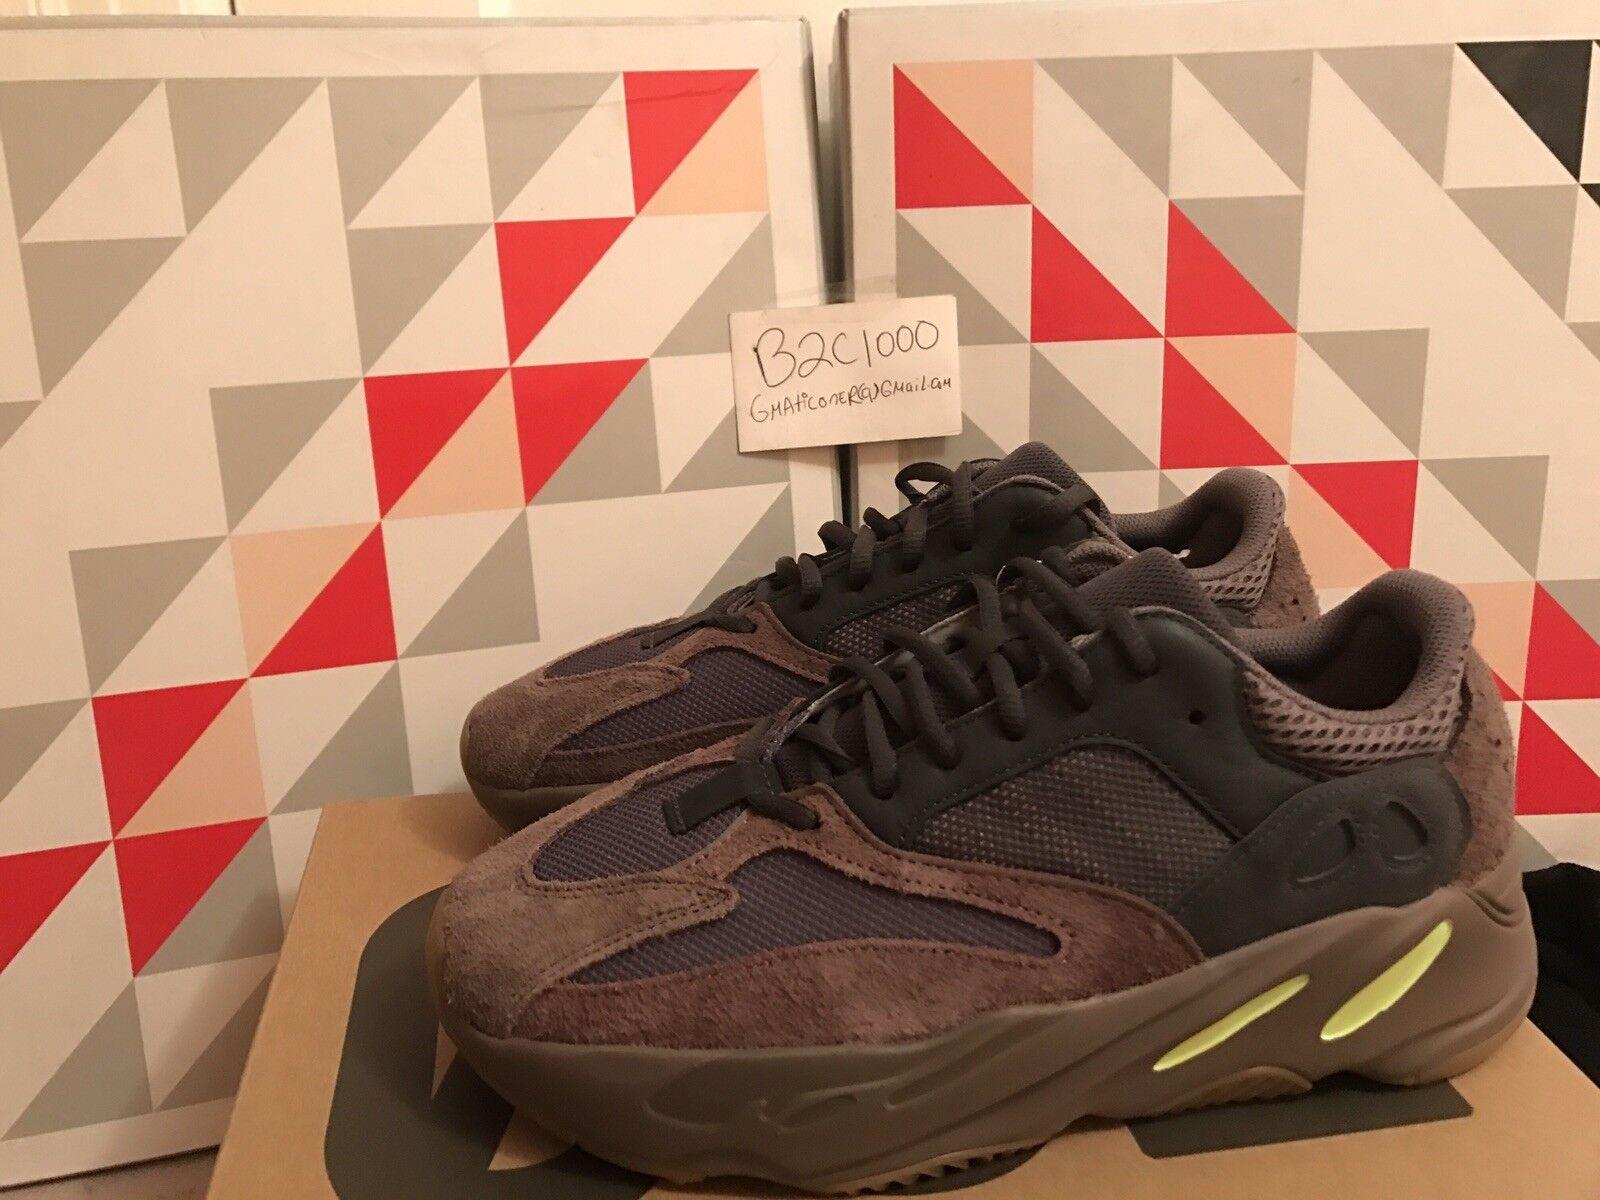 Adidas Adidas Adidas Yeezy Boost 700 Mauve Wave Runner Size 10 New Nib 350 500 6537b5